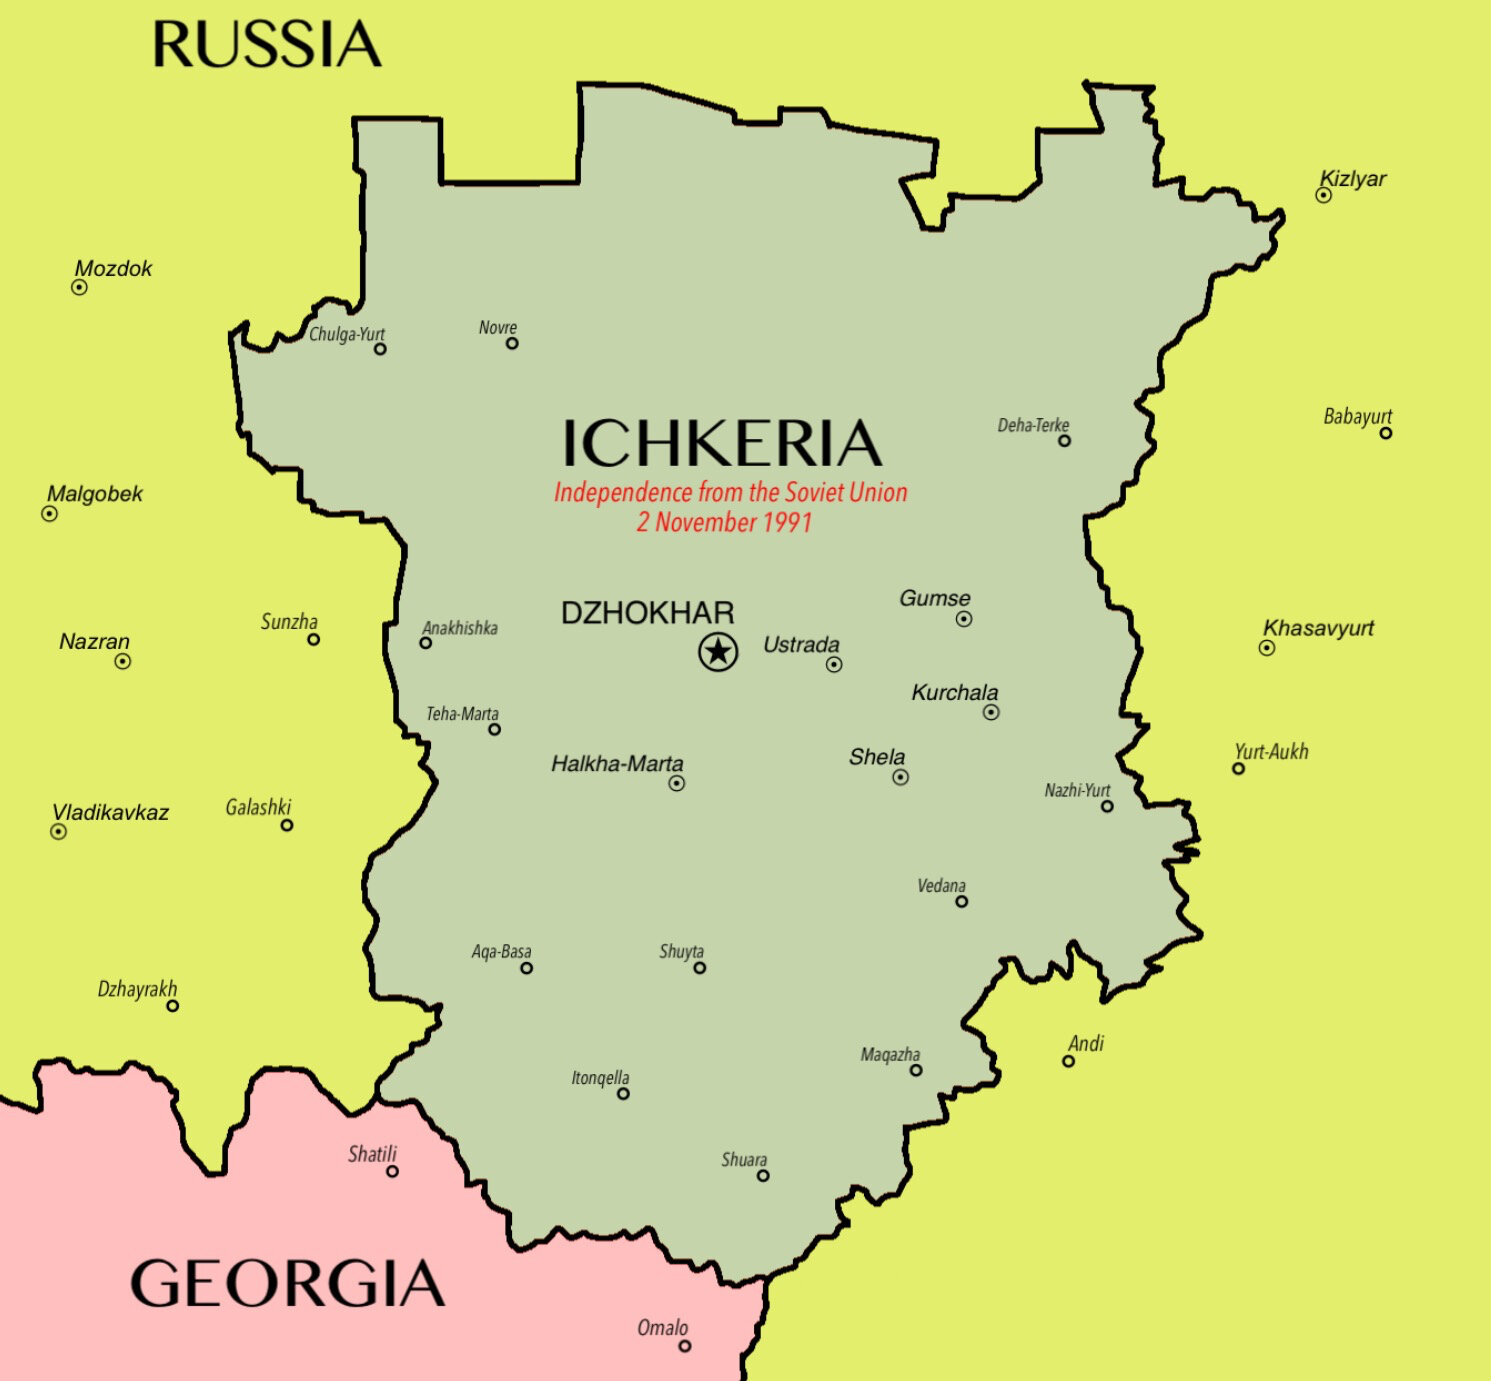 File:Map of Ichkeria (Chechnya).jpg - Wikipedia on azerbaijan map, armenia map, serbia map, russia map, north korea map, second chechen war, ramzan kadyrov, slovenia map, shamil basayev, caucasus map, beslan school hostage crisis, pakistan map, chechen people, kyrgyzstan map, novaya zemlya map, kalmykia map, uzbekistan map, saint petersburg, first chechen war, dagestan map, caucasus mountains, grozny map, siberia map, slovakia map, moscow map, ukraine map, europe map, north caucasus, georgia map, moscow theater hostage crisis,